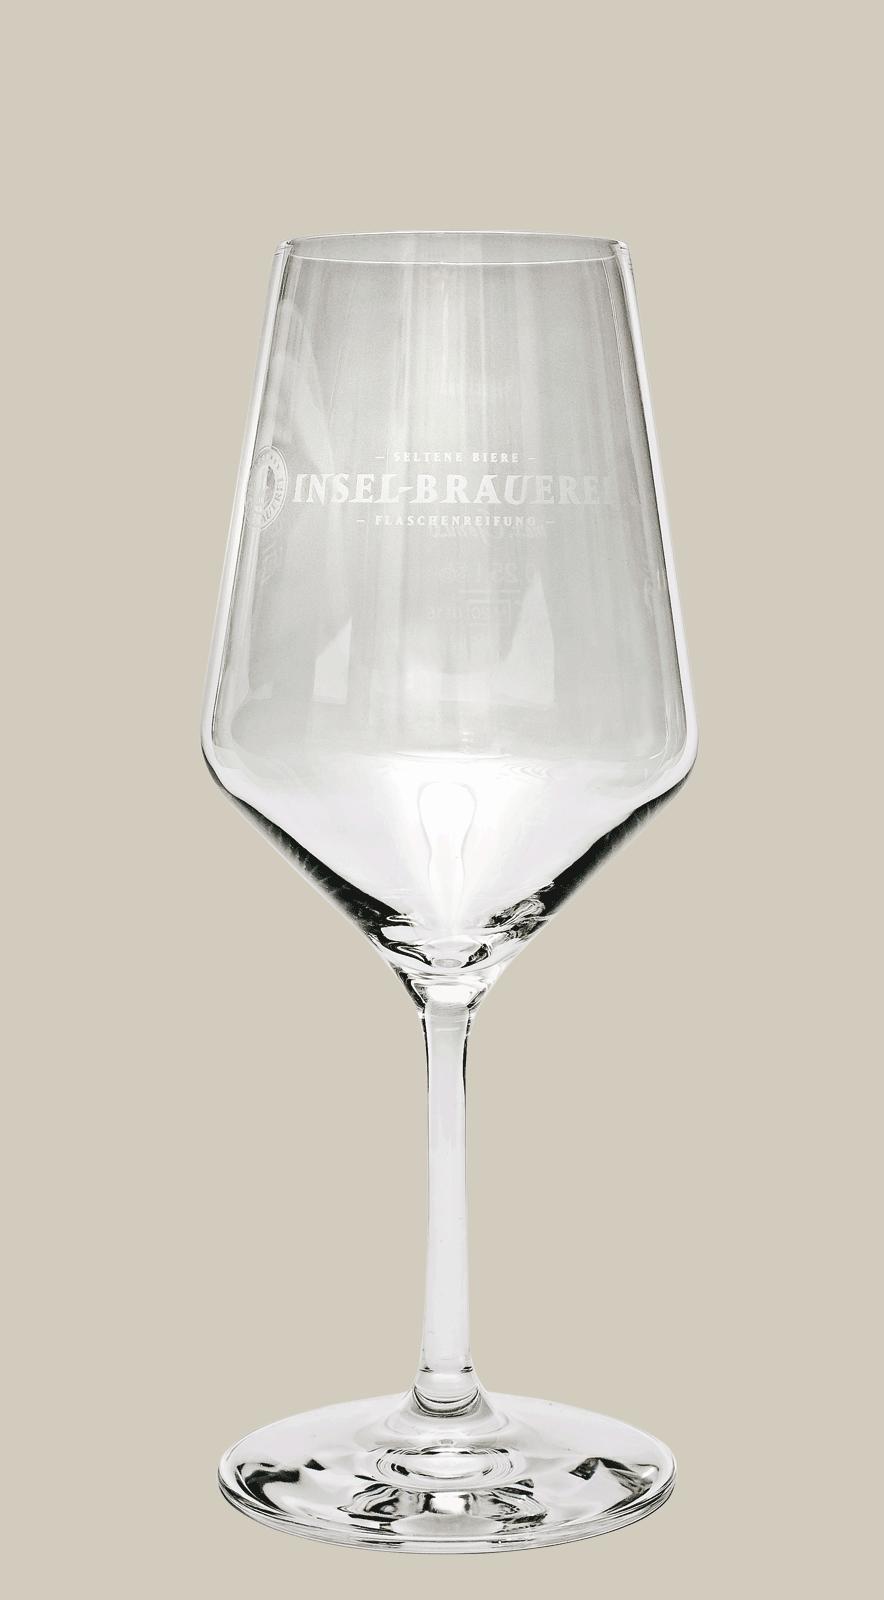 Sommelierglas - Logo Insel-Brauerei